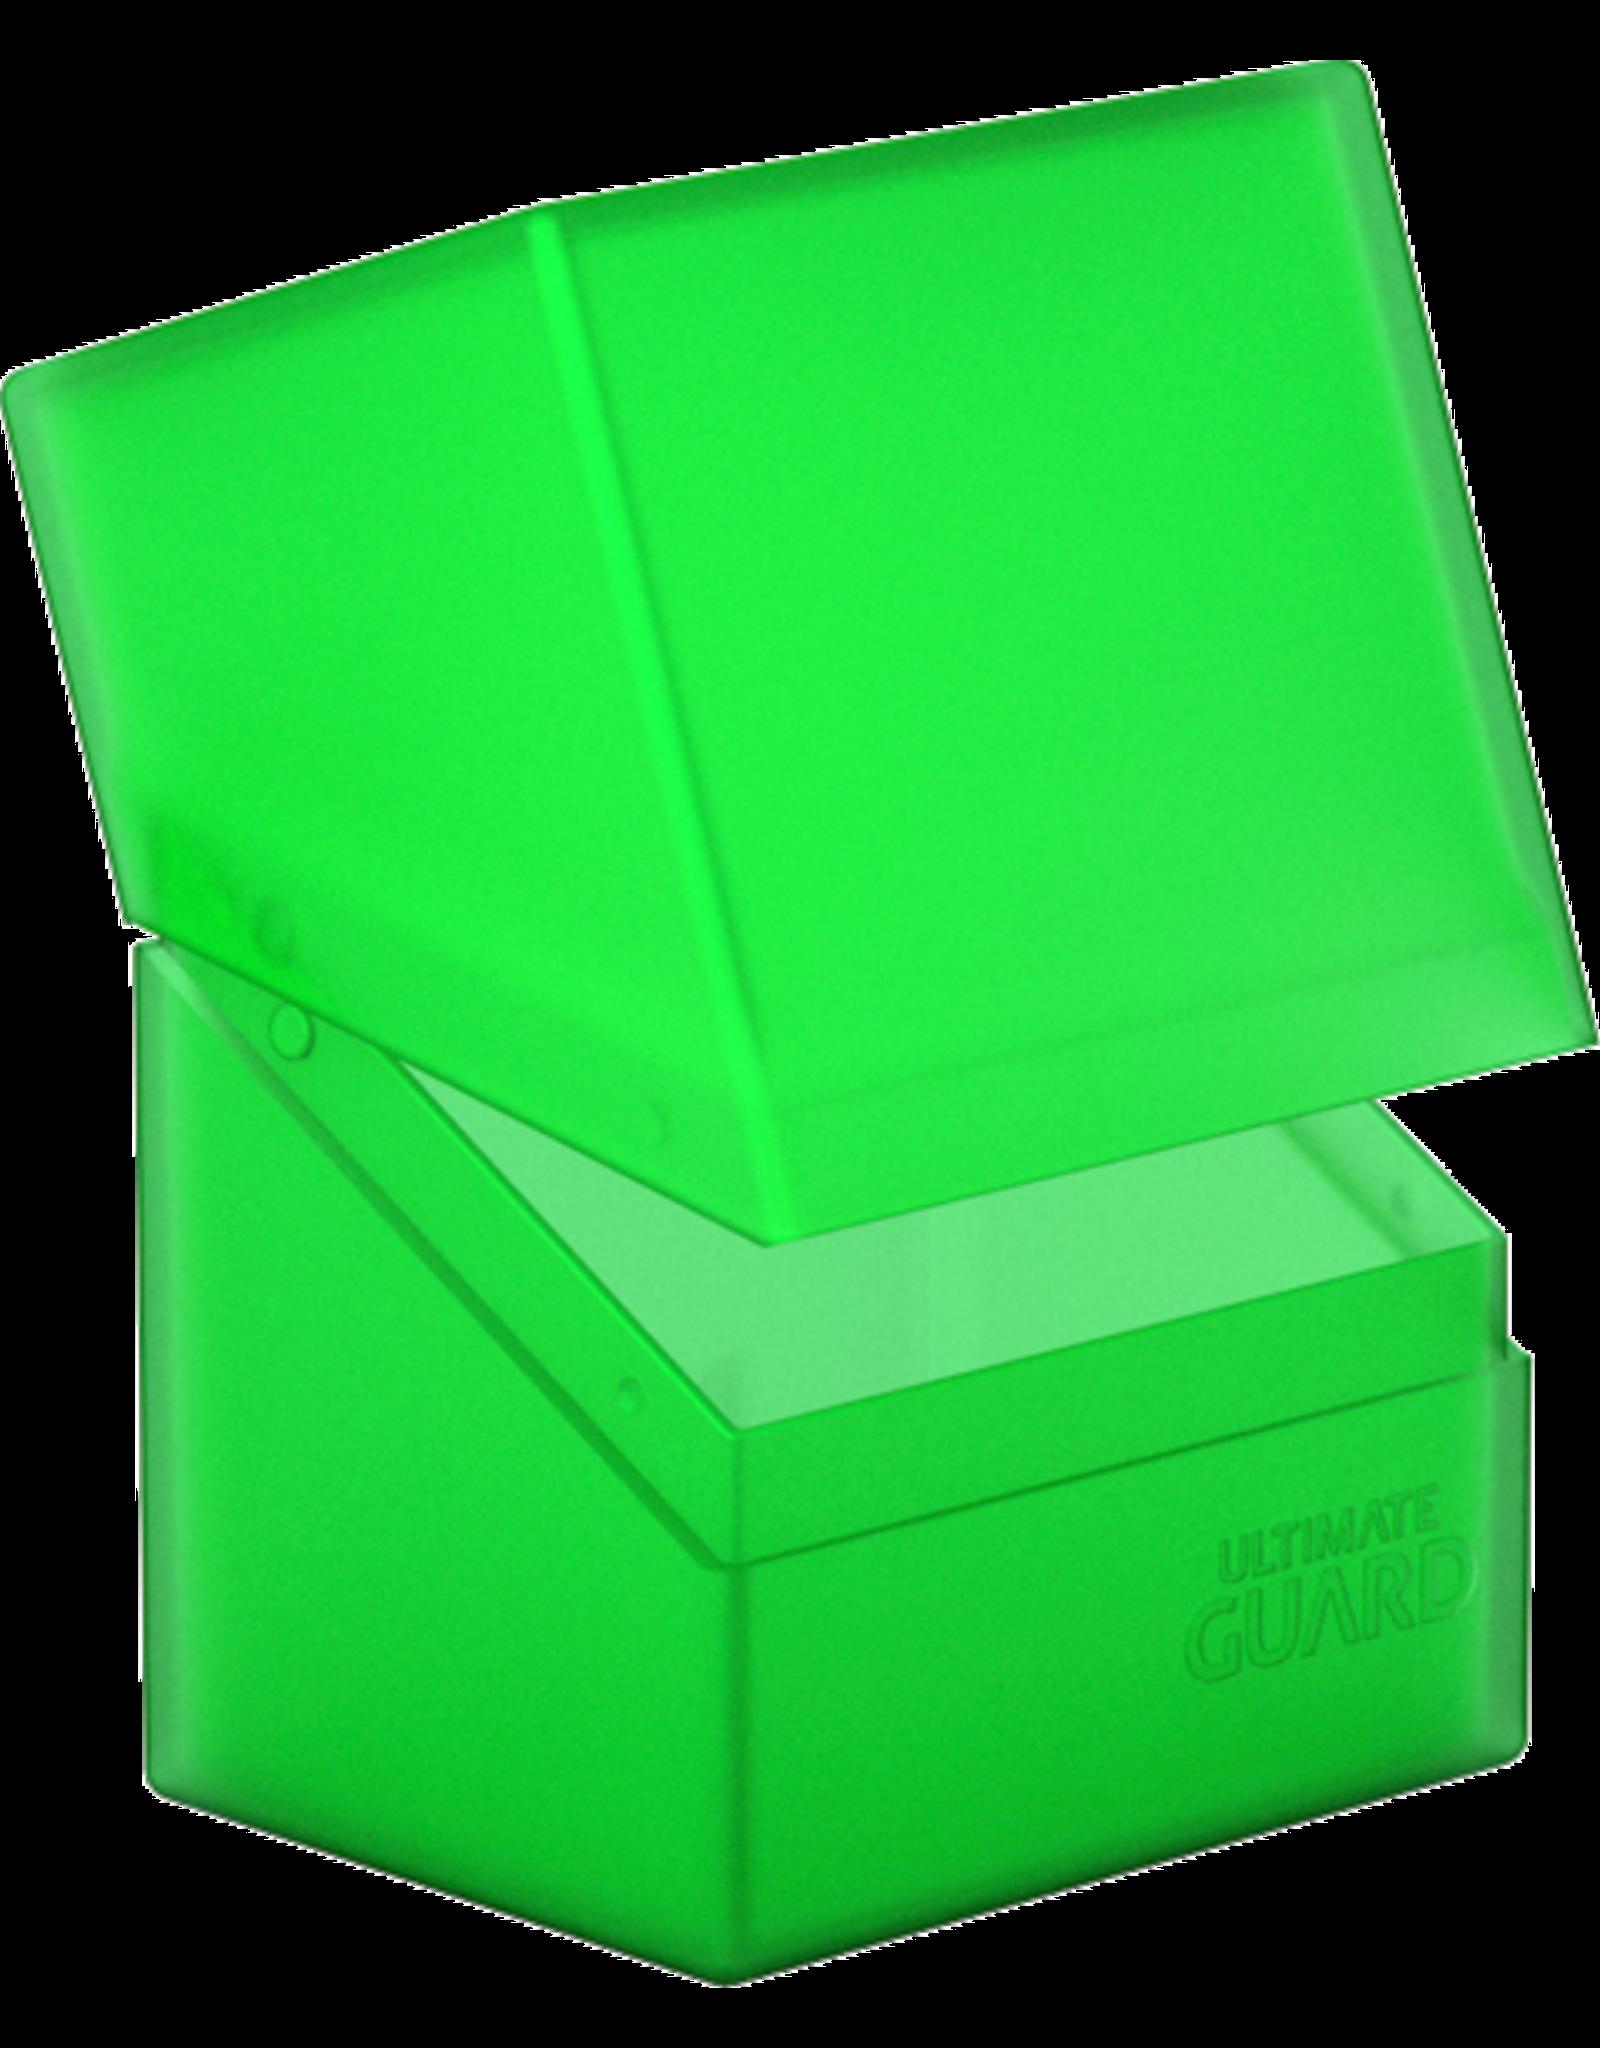 Ultimate Guard Ultimate Guard Deck Case Boulder 80+ Emerald